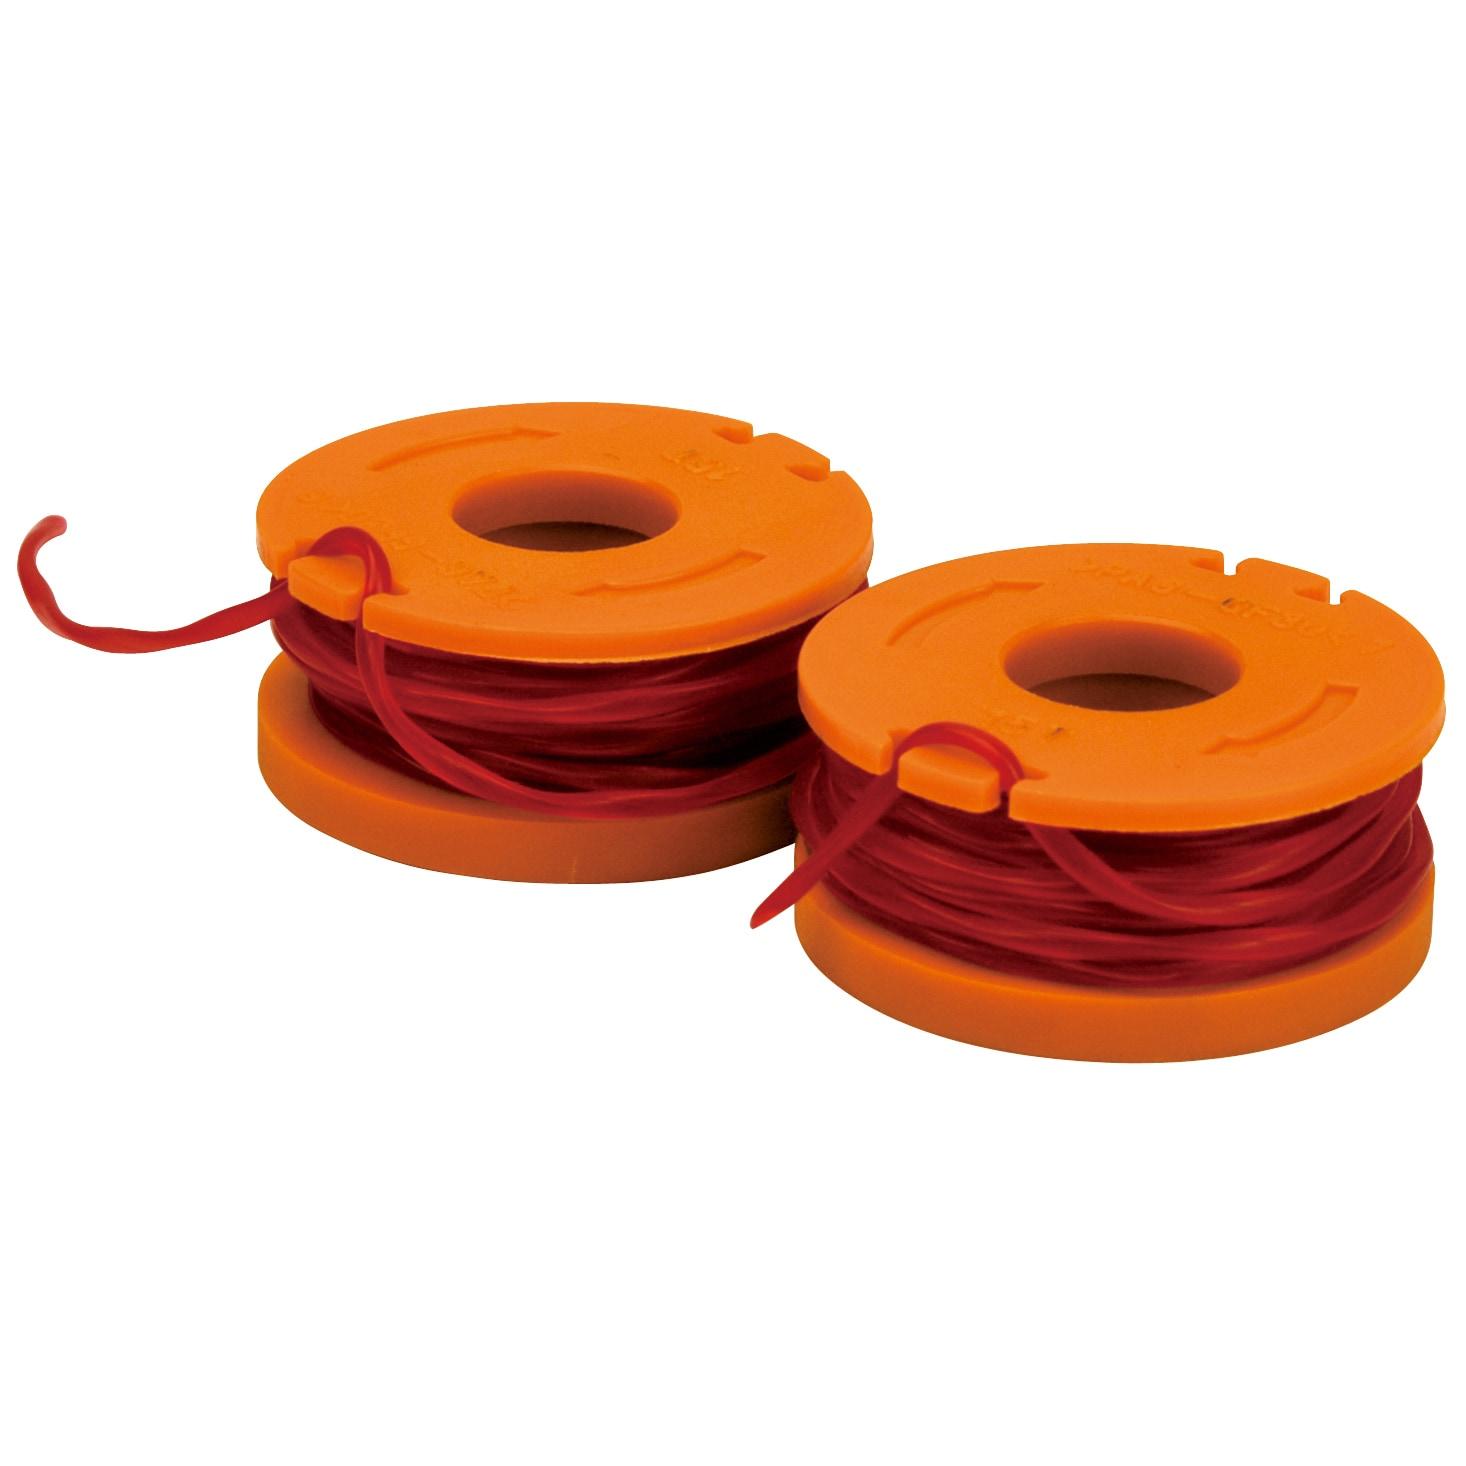 WORX WA0004.M1 10-foot Cordless String Trimmer Replacemen...